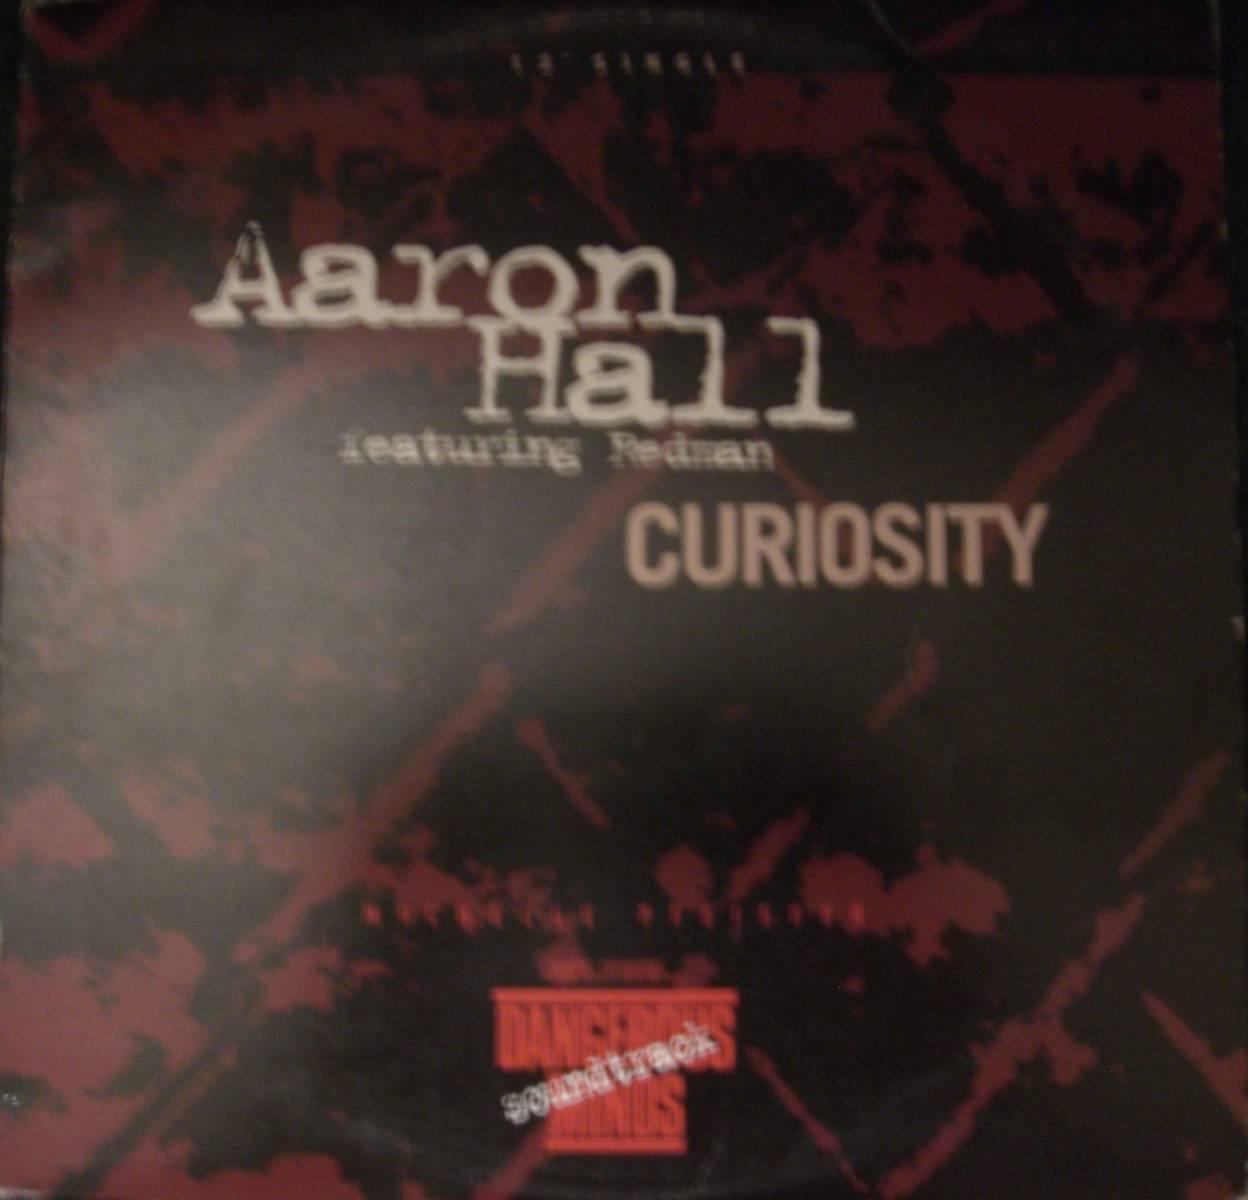 Aaron Hall - Curiosity Lyrics | MetroLyrics